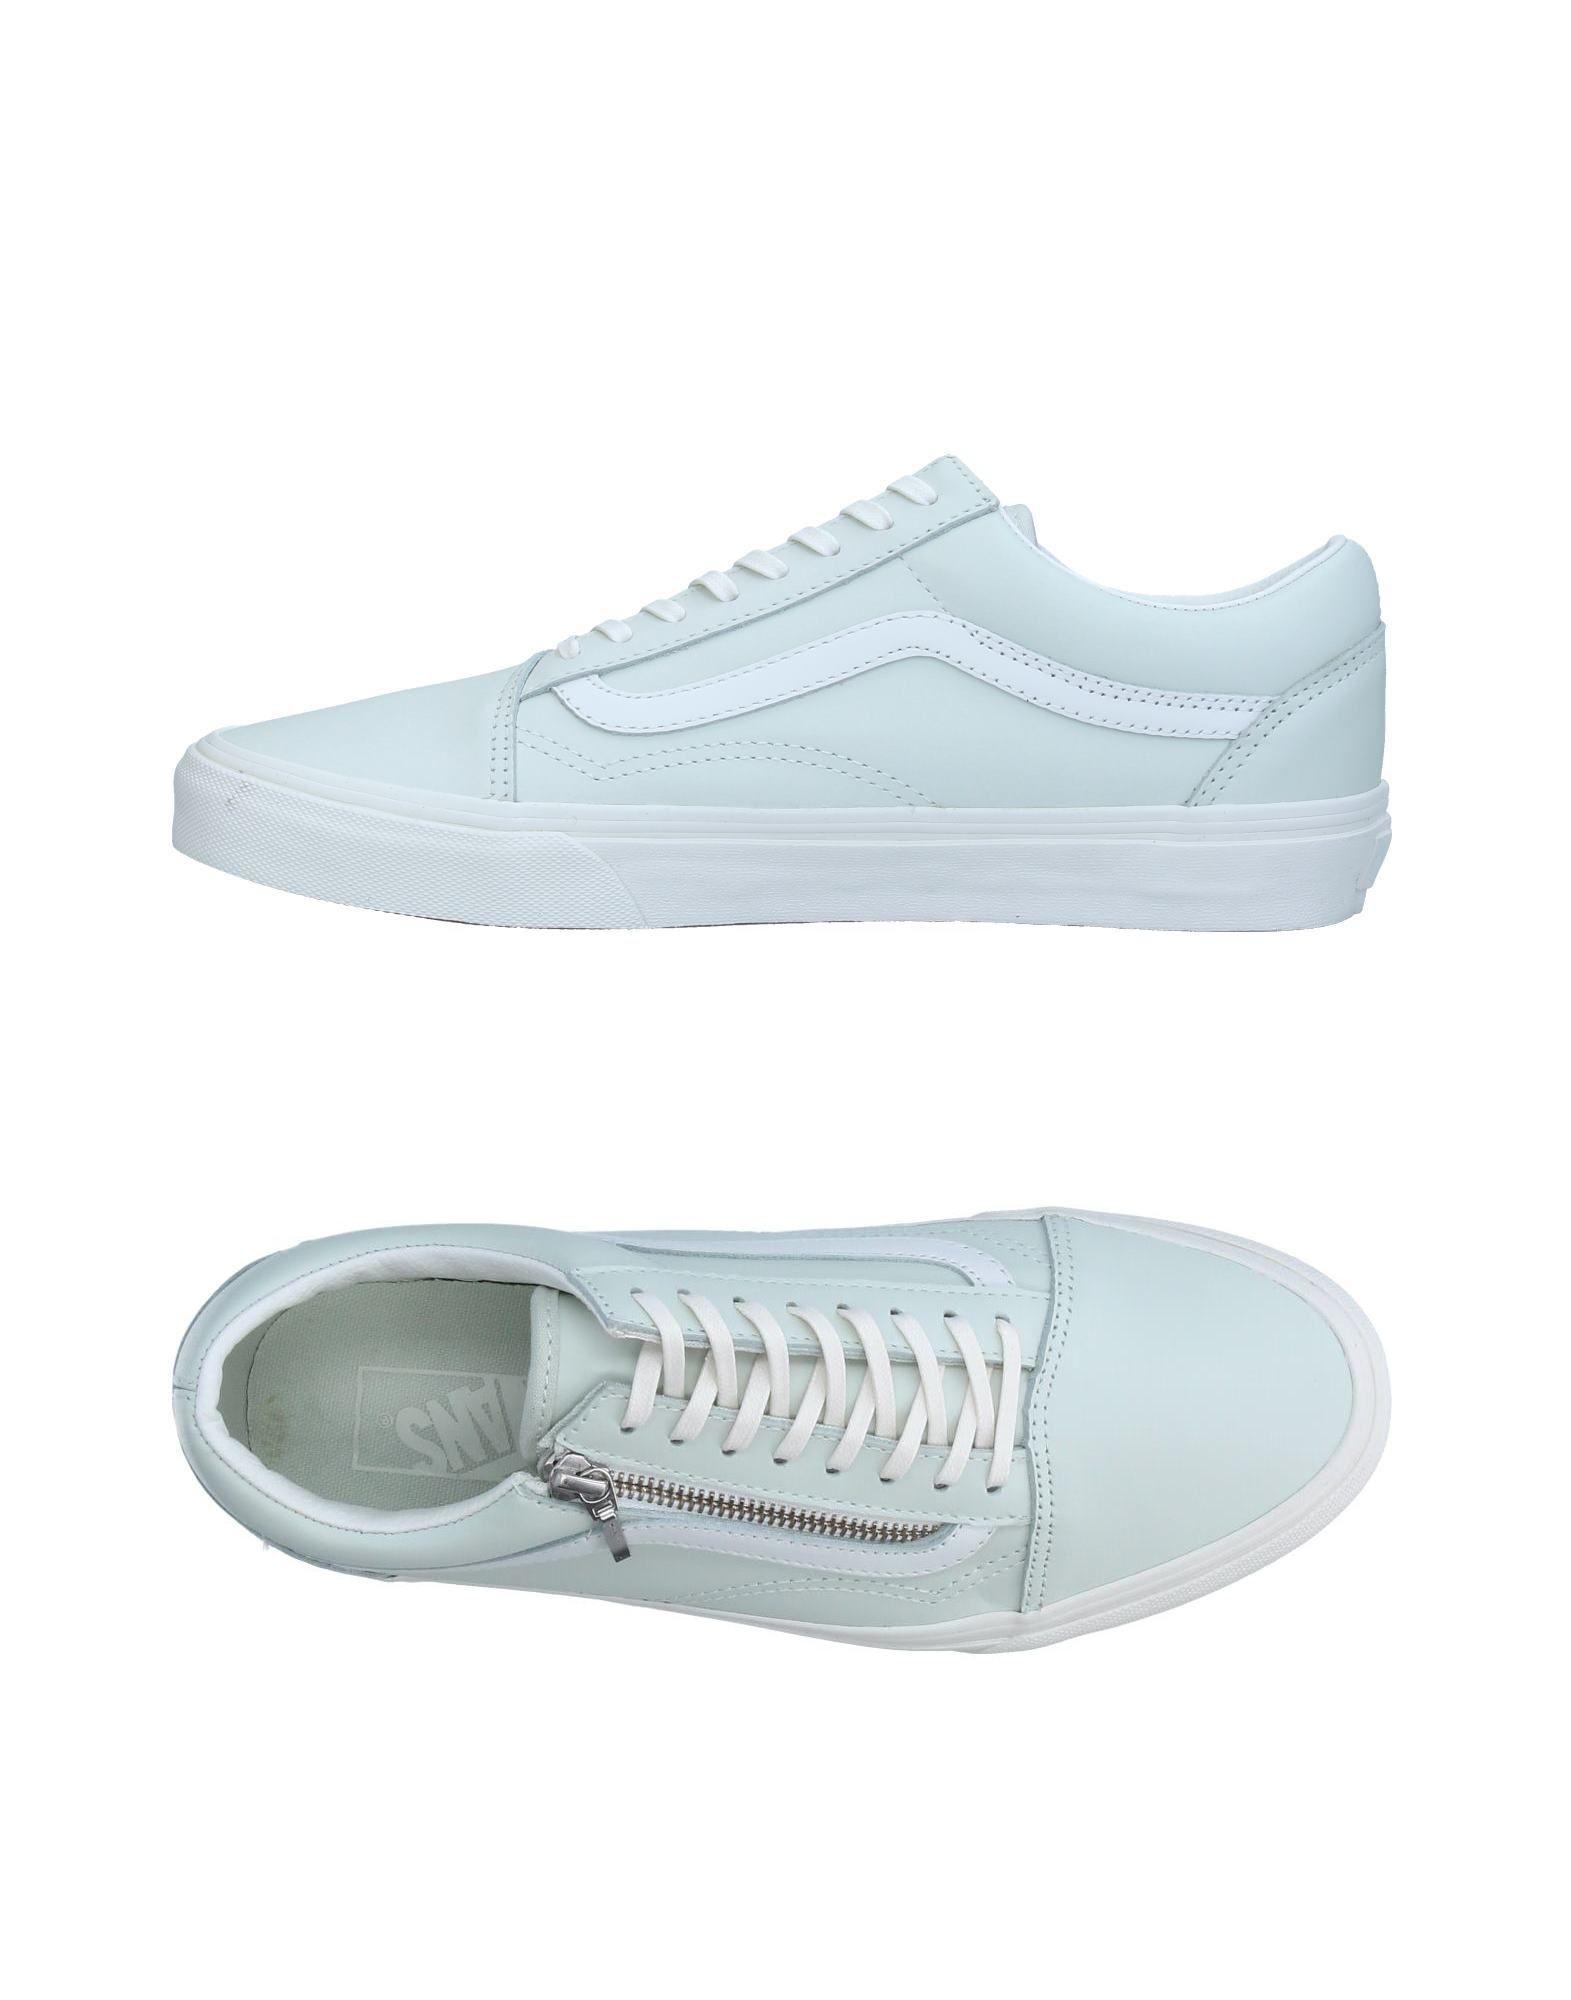 Vans Sneakers Herren  11354610WO Schuhe Heiße Schuhe 11354610WO c57e11